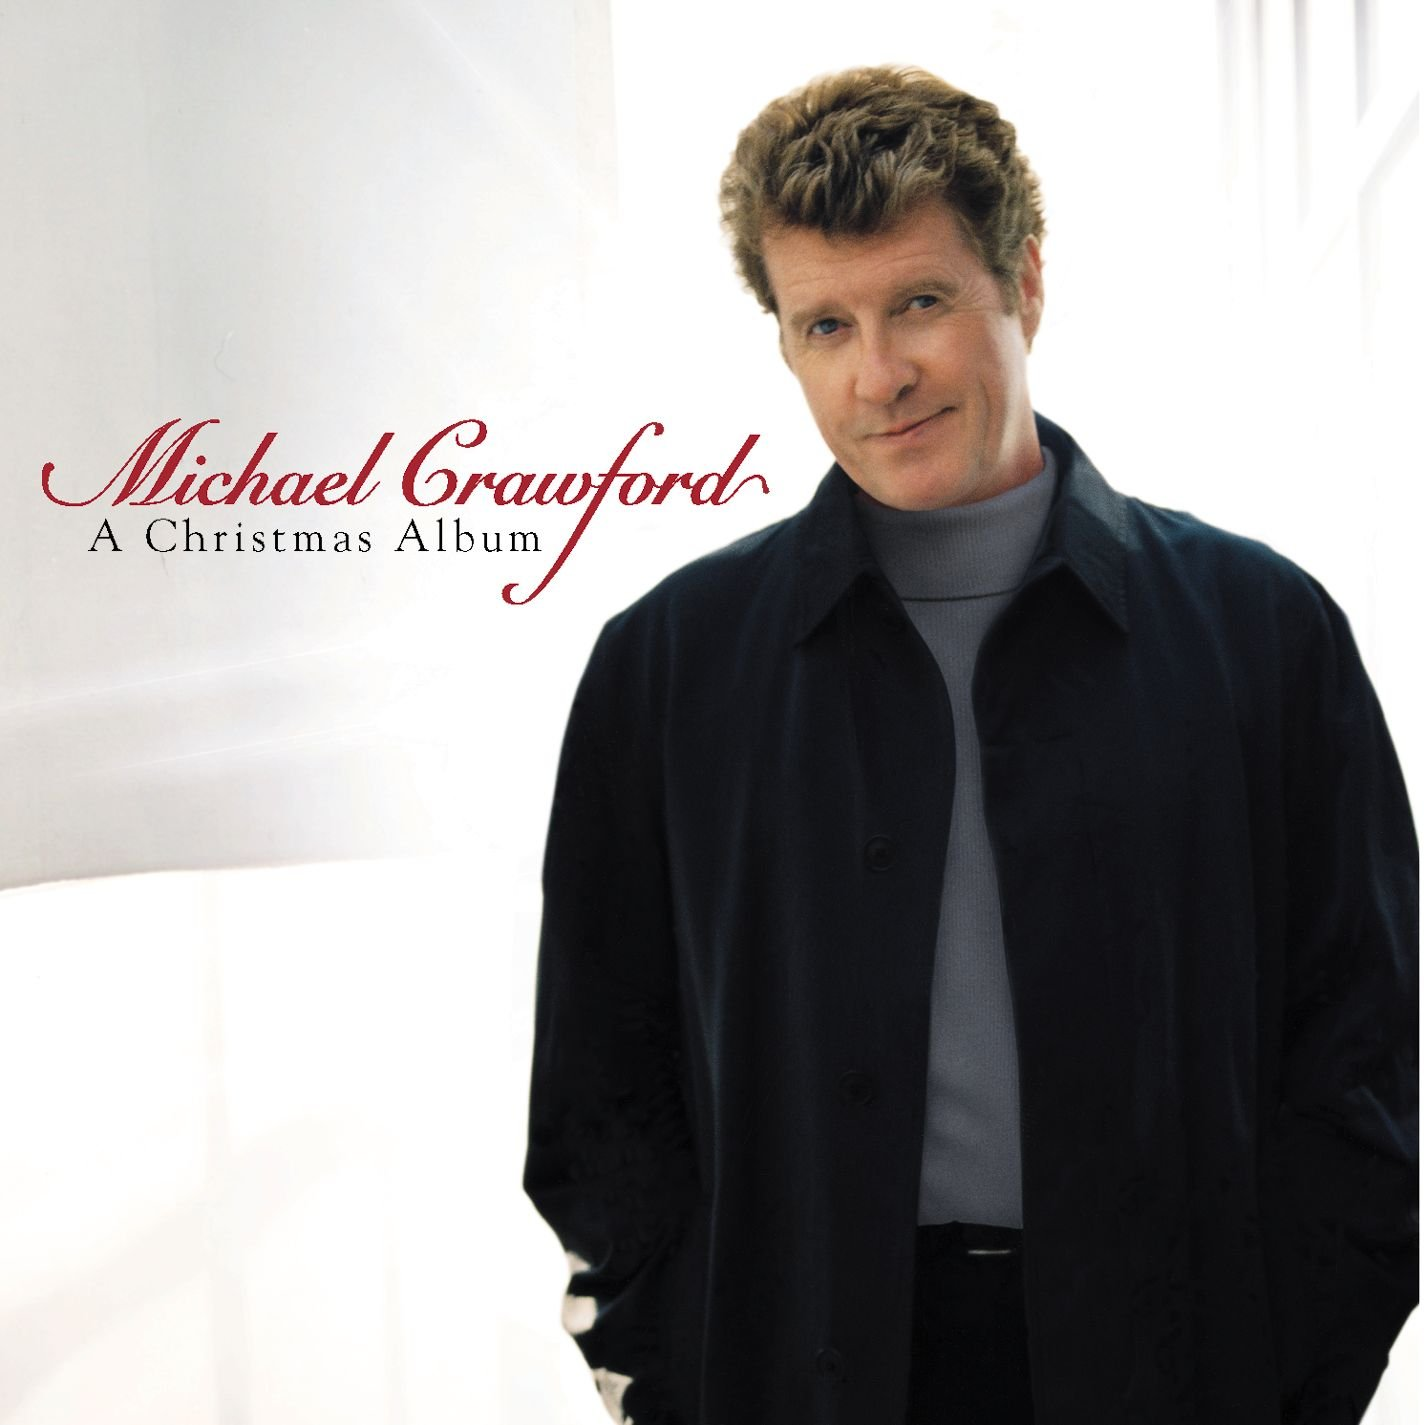 Michael Crawford - A Christmas Album - Amazon.com Music